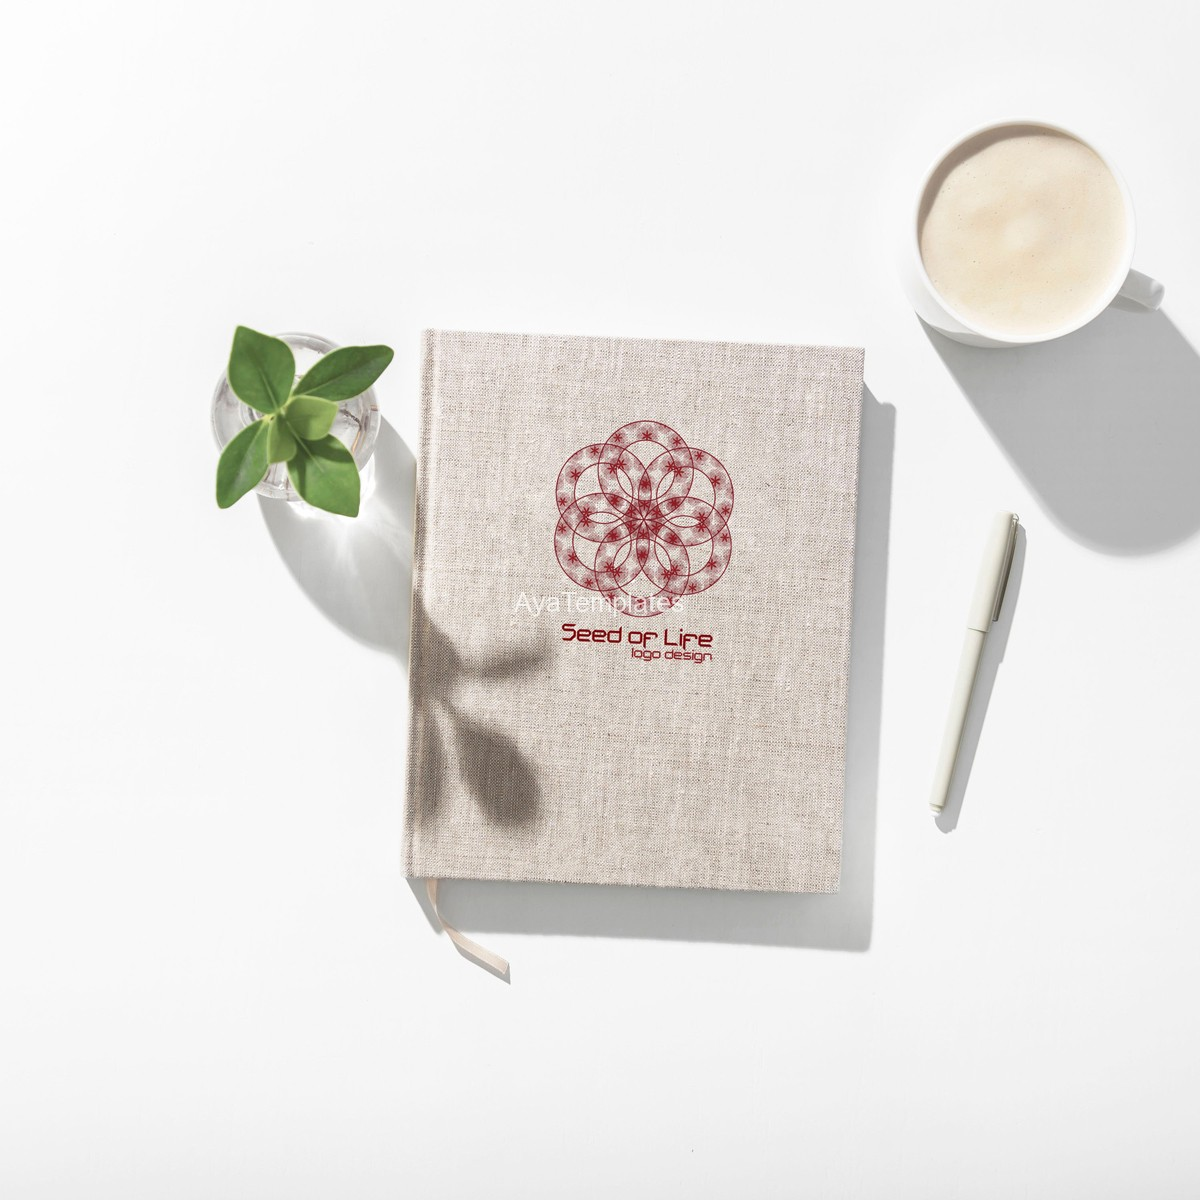 Seed-of-life-logo-design-mockup-brand-identity